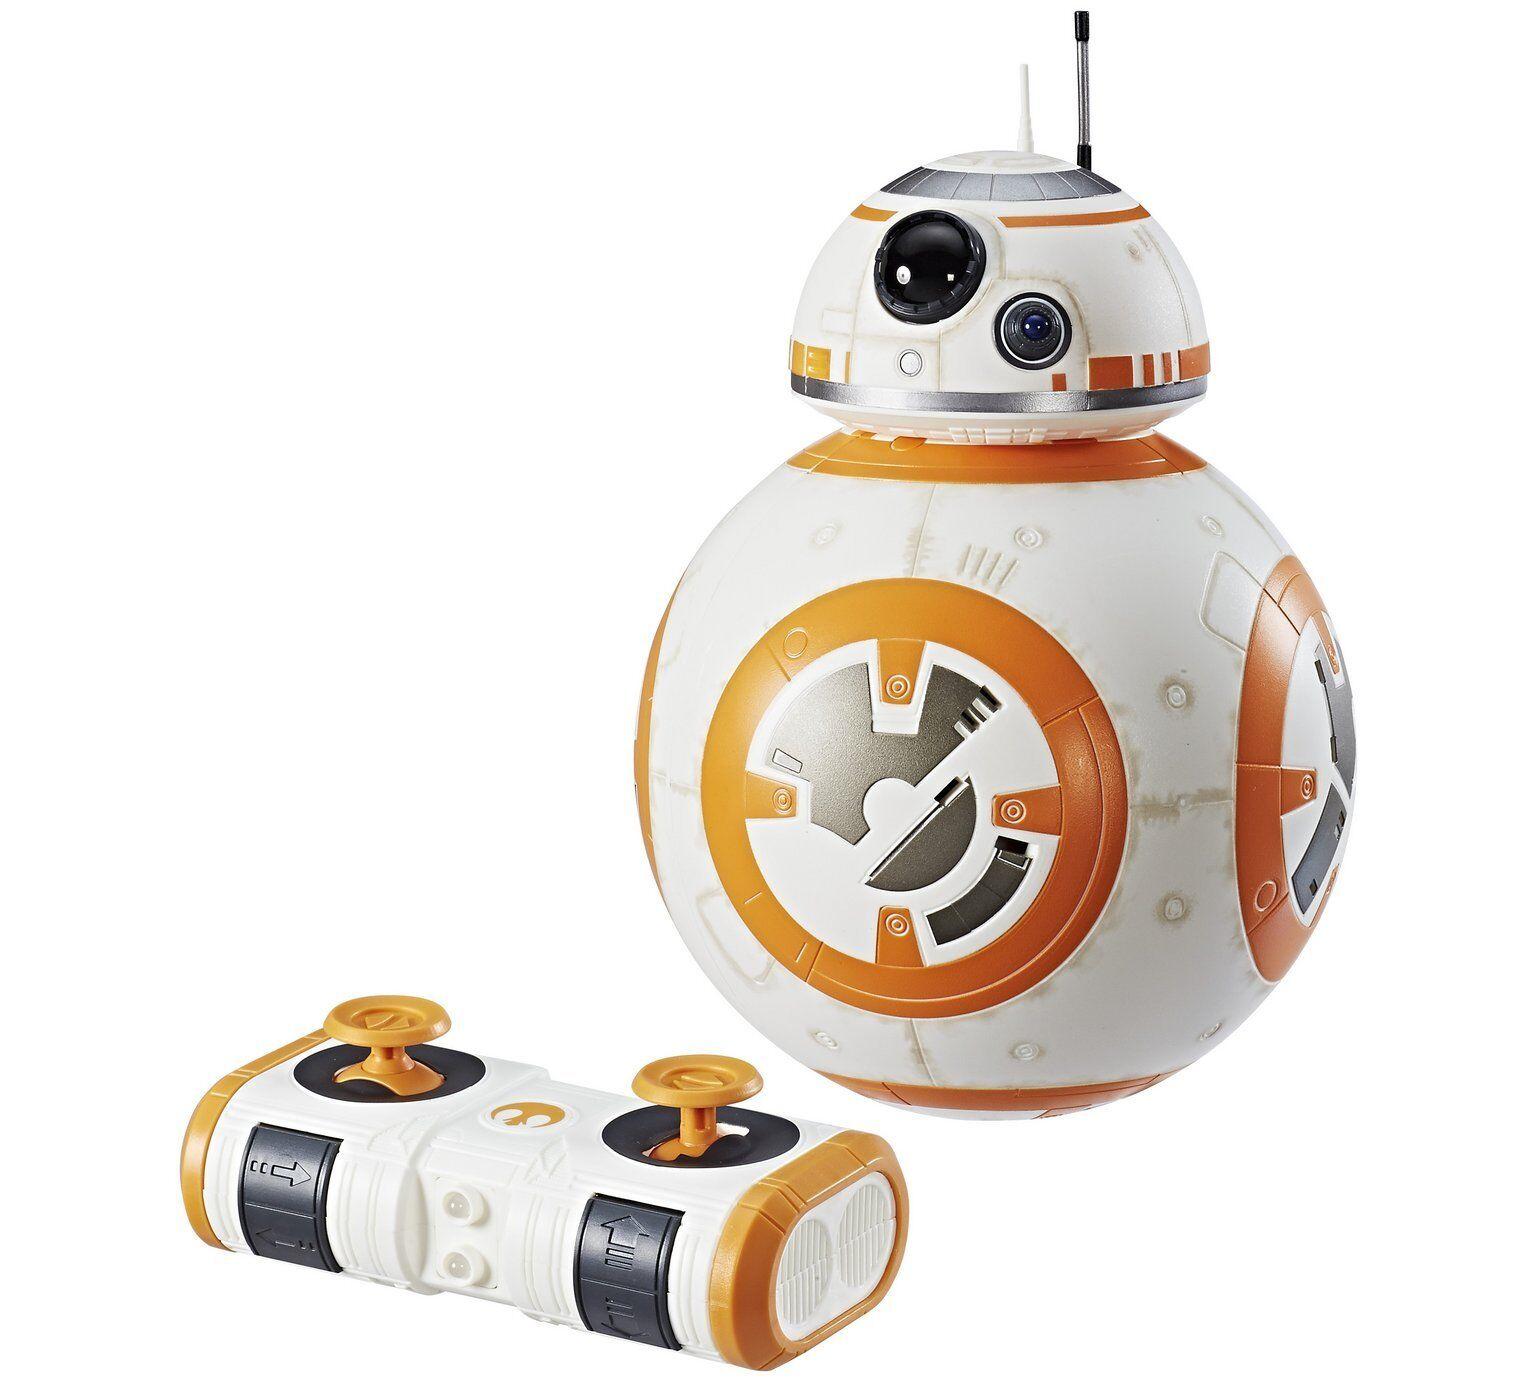 Hasbro Star Wars The Last Jedi Remote Control RC Hyperdrive BB-8 Droid Kids Toy